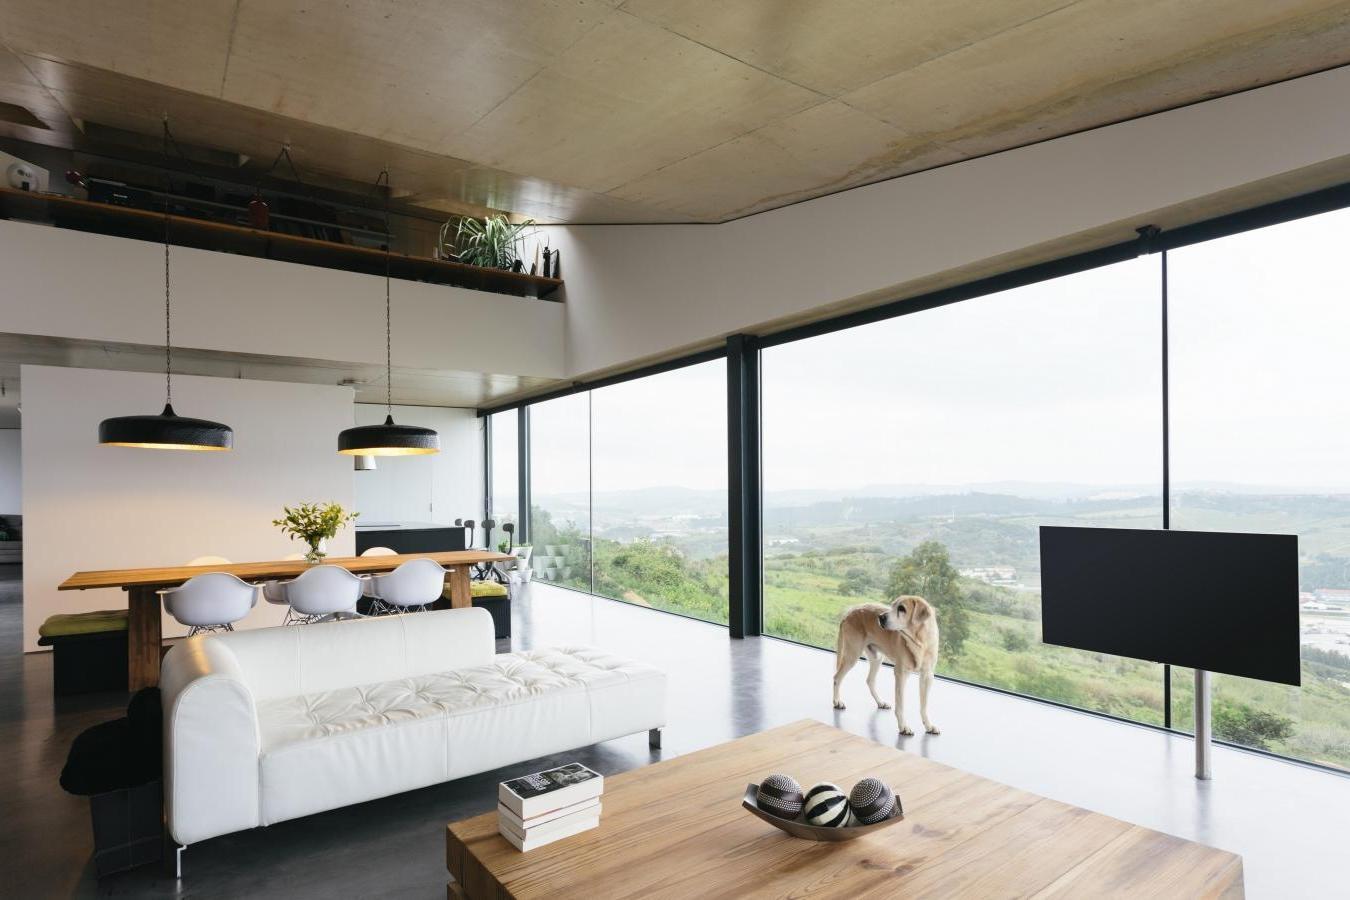 geamurile-mari-in-designul-de-interior-18